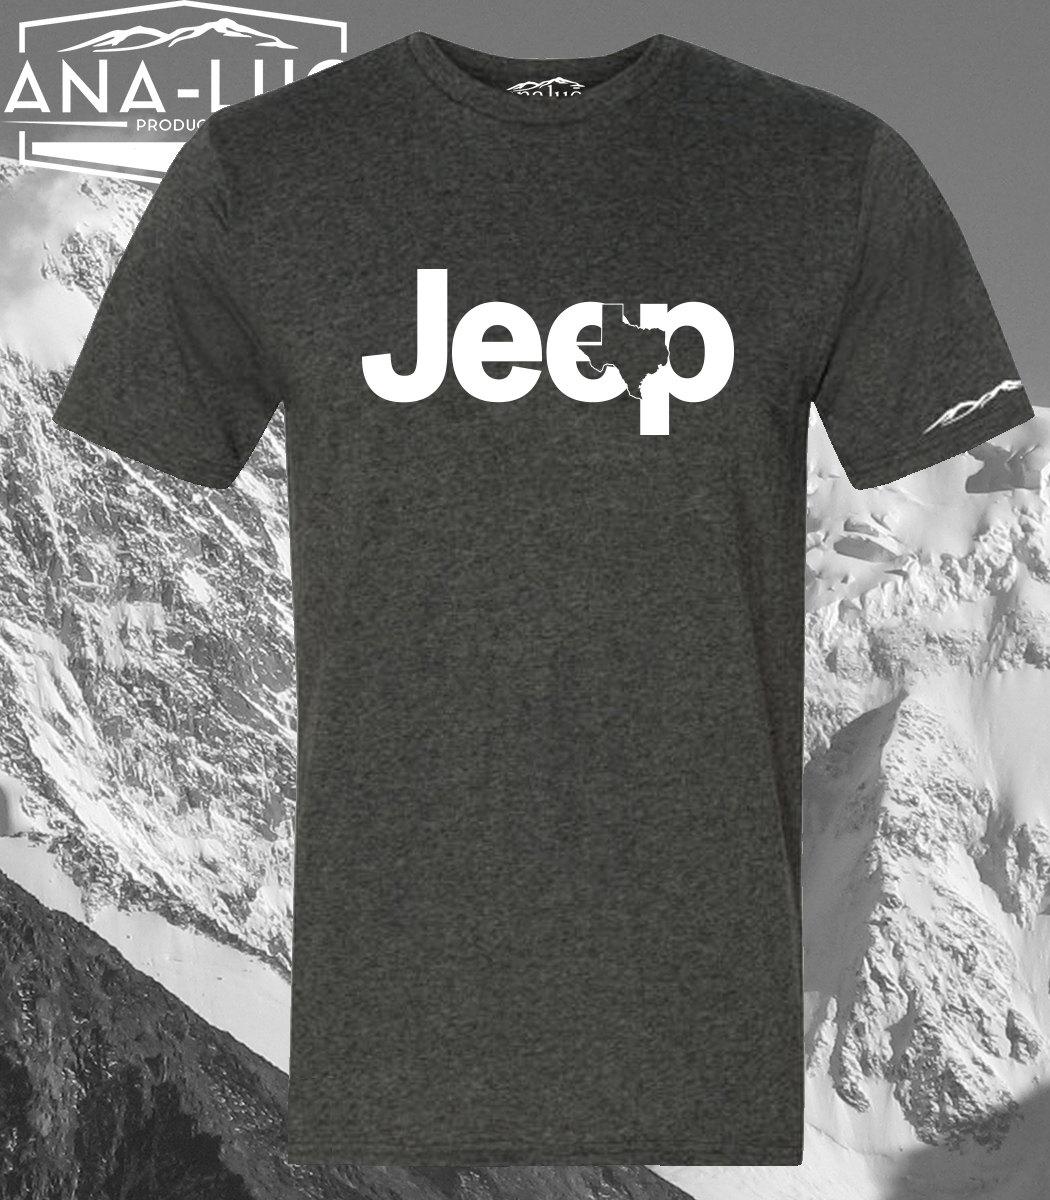 Jeep Shirt Jeep Wrangler Shirt Texas Jeep Logo - Jeep logo t shirt